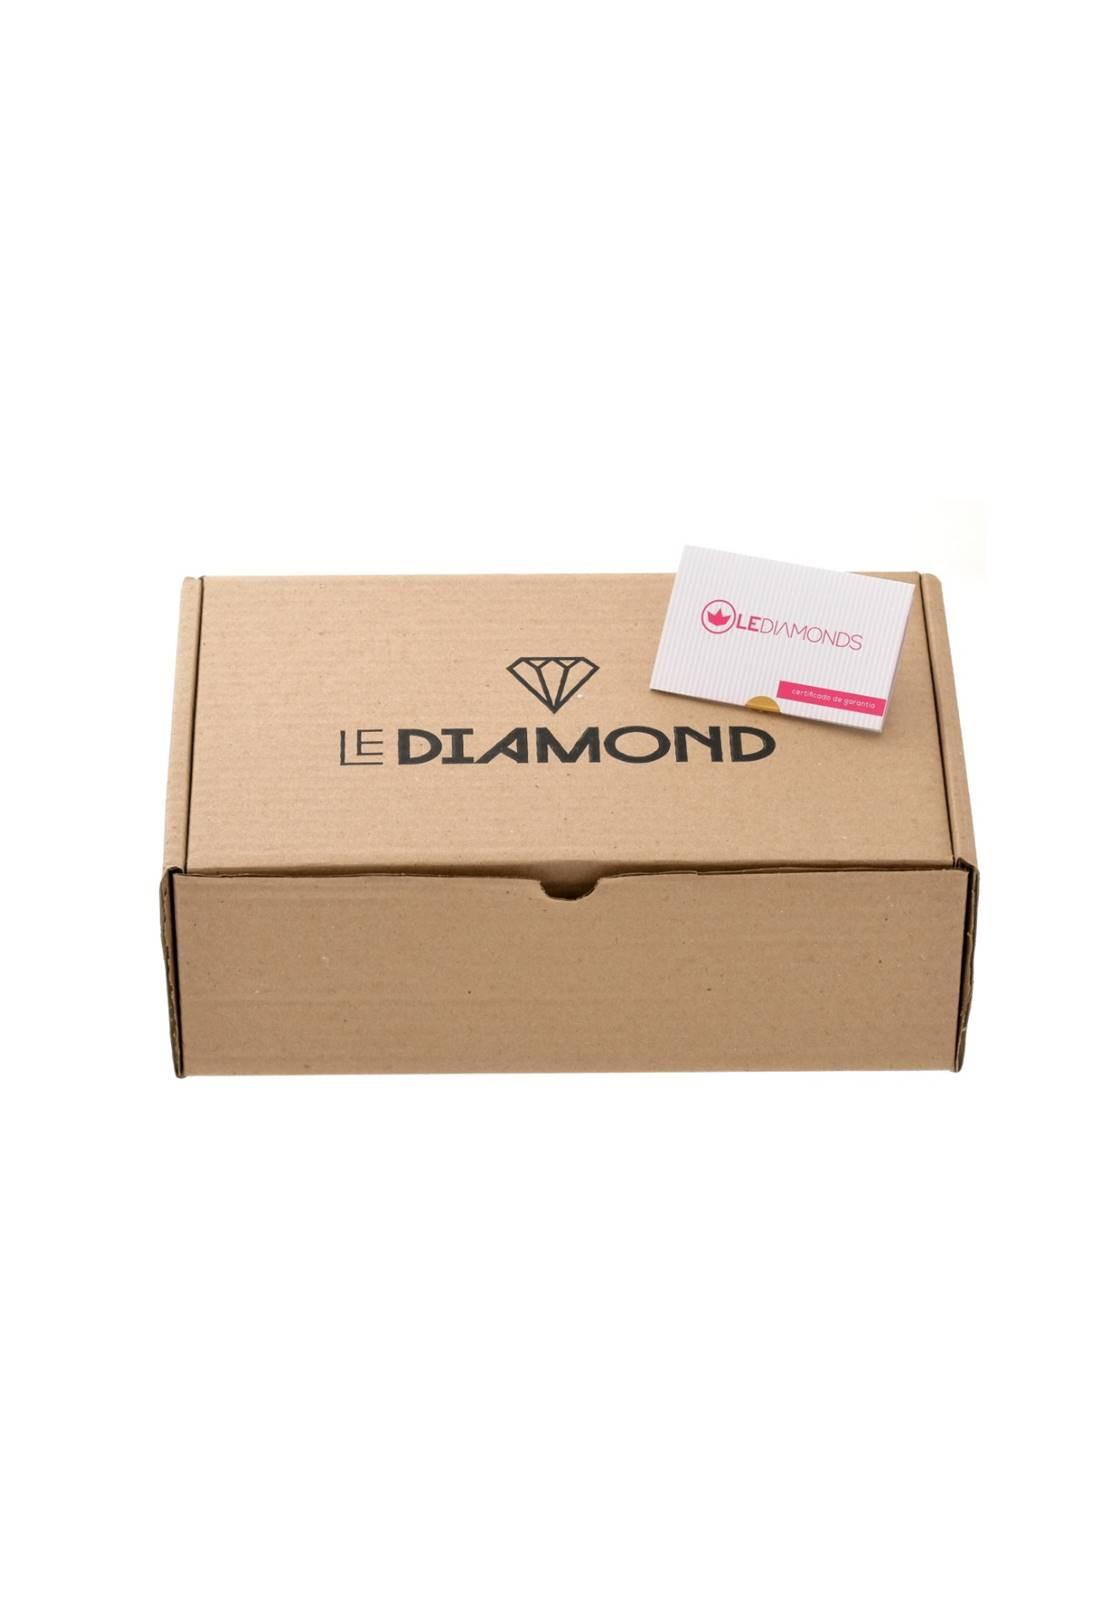 Brinco Le Diamond Piercing Falso com zircônia Dourado